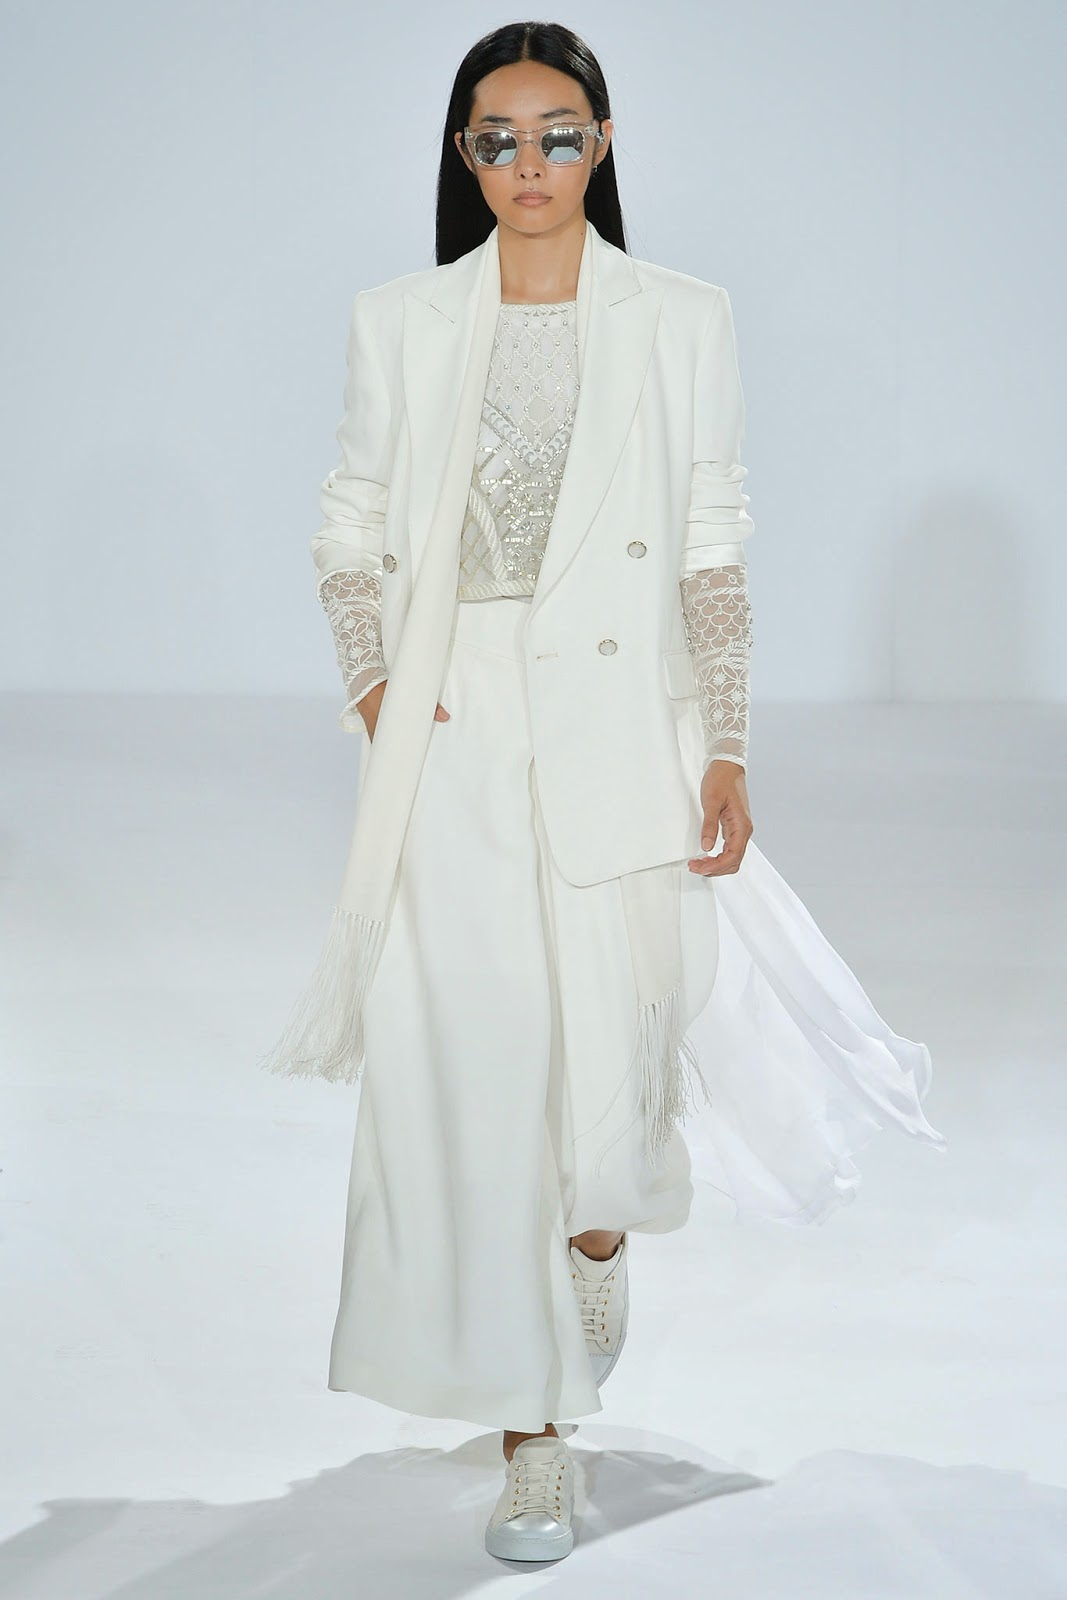 Moda Banco tendência primavera verão 2015 look branco